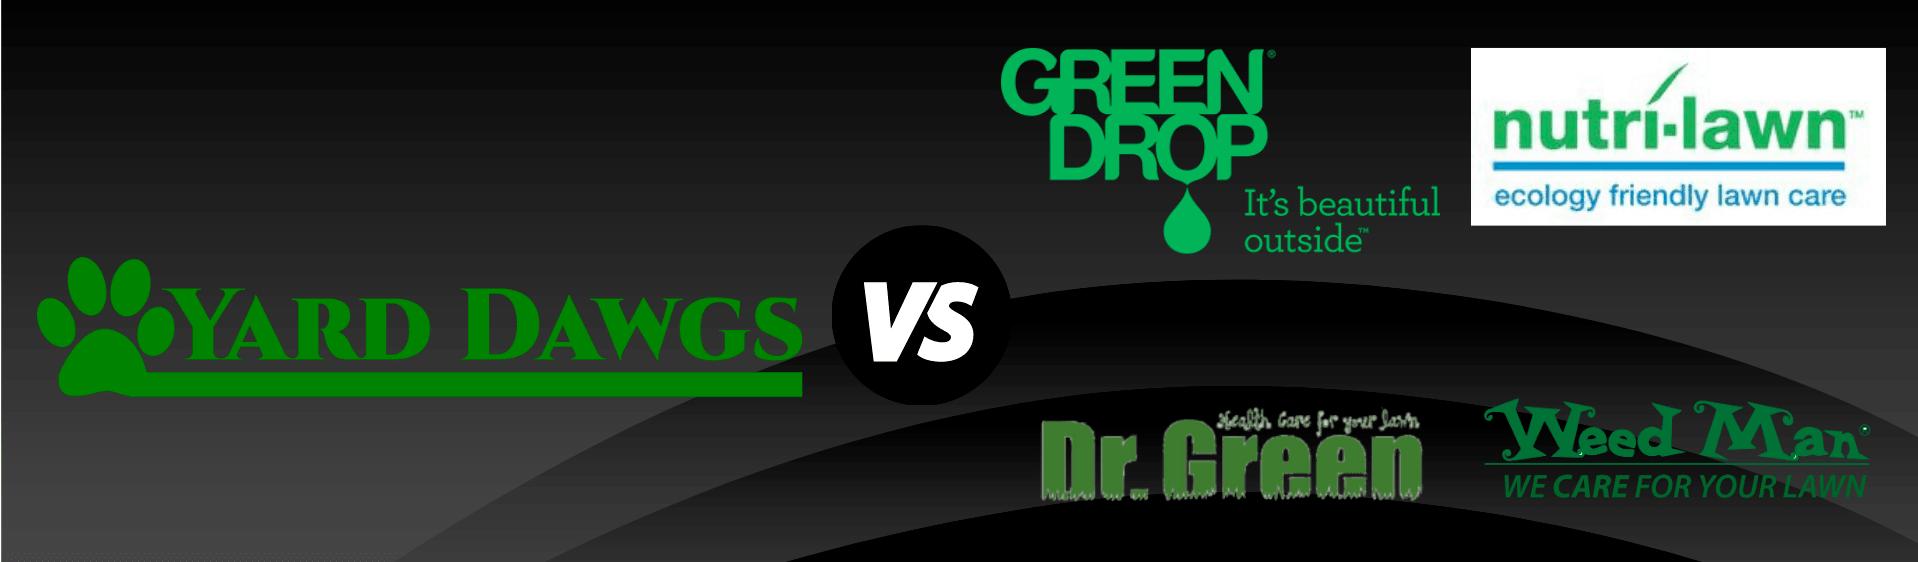 Blog: Yard Dawgs Lawn Care vs. The Competitors [An Unbias Comparison]